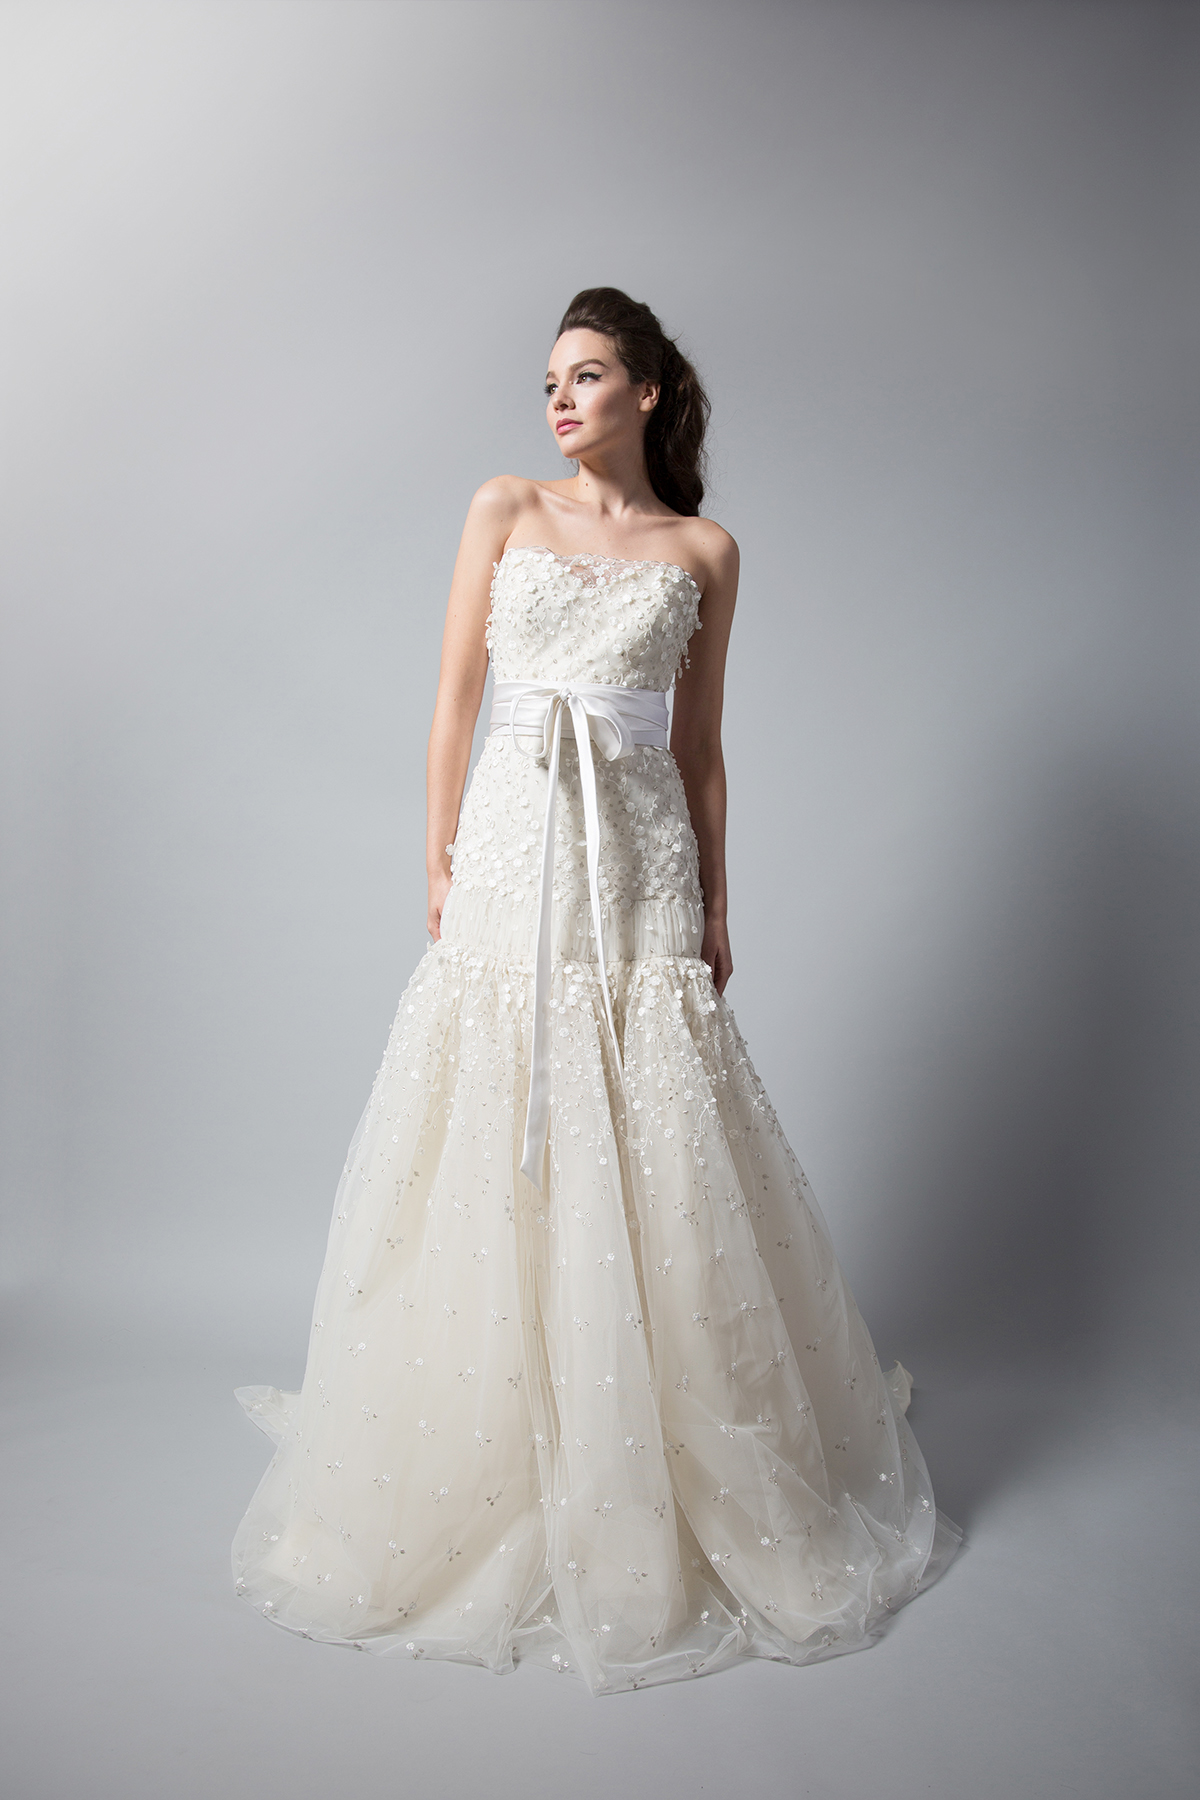 randi rahm a-line wedding dress with floral embellishments fall 2018